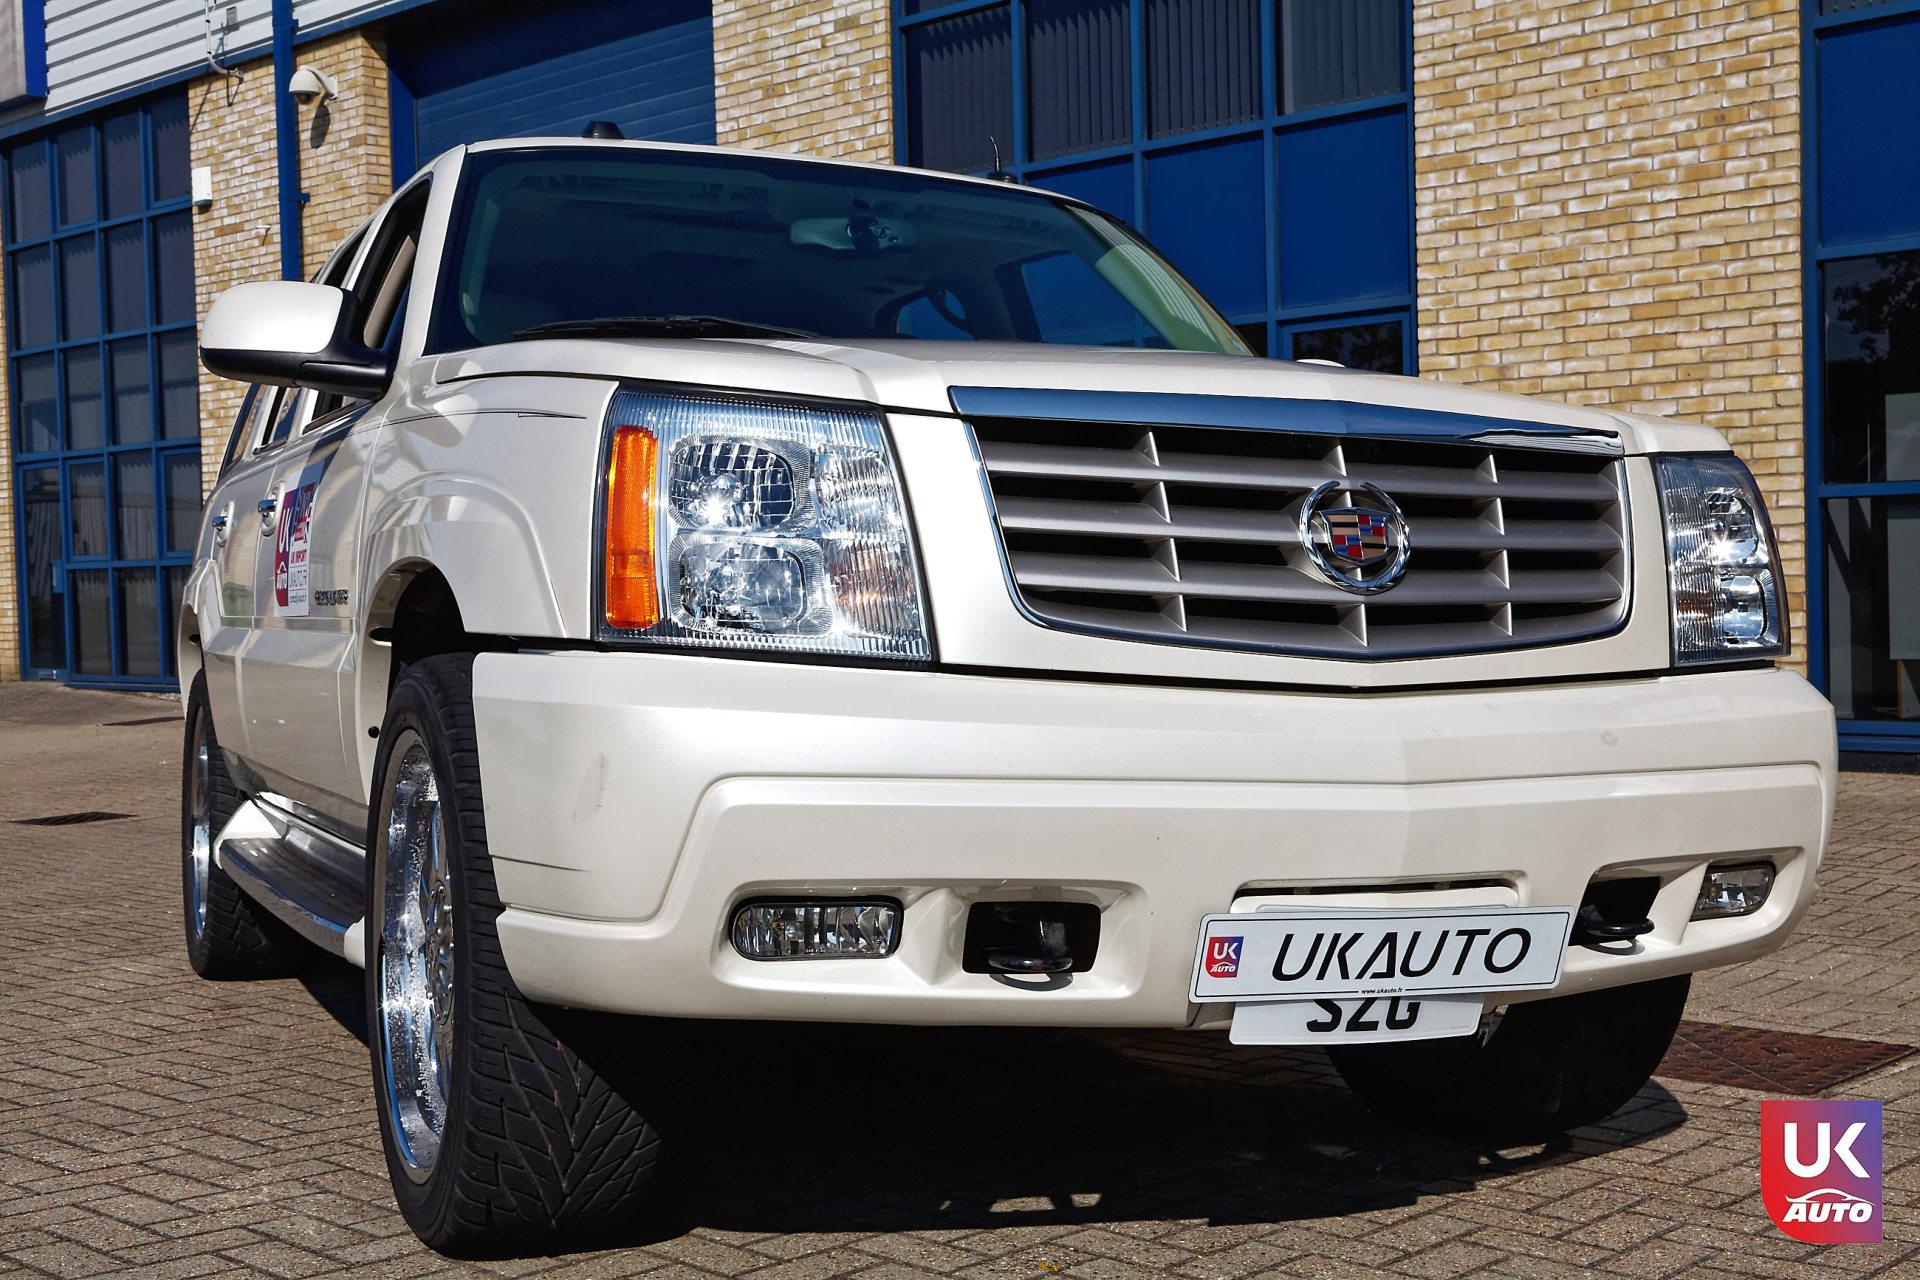 Cadillac Escalade lhd import cadillac angleterre cadillac uk ukauto us import lhd3 DxO - AUTO IMPORT CADILLAC ESCALADE V8 LHD IMPORTATION CADILLAC LHD FELICITATION A BERTRAND